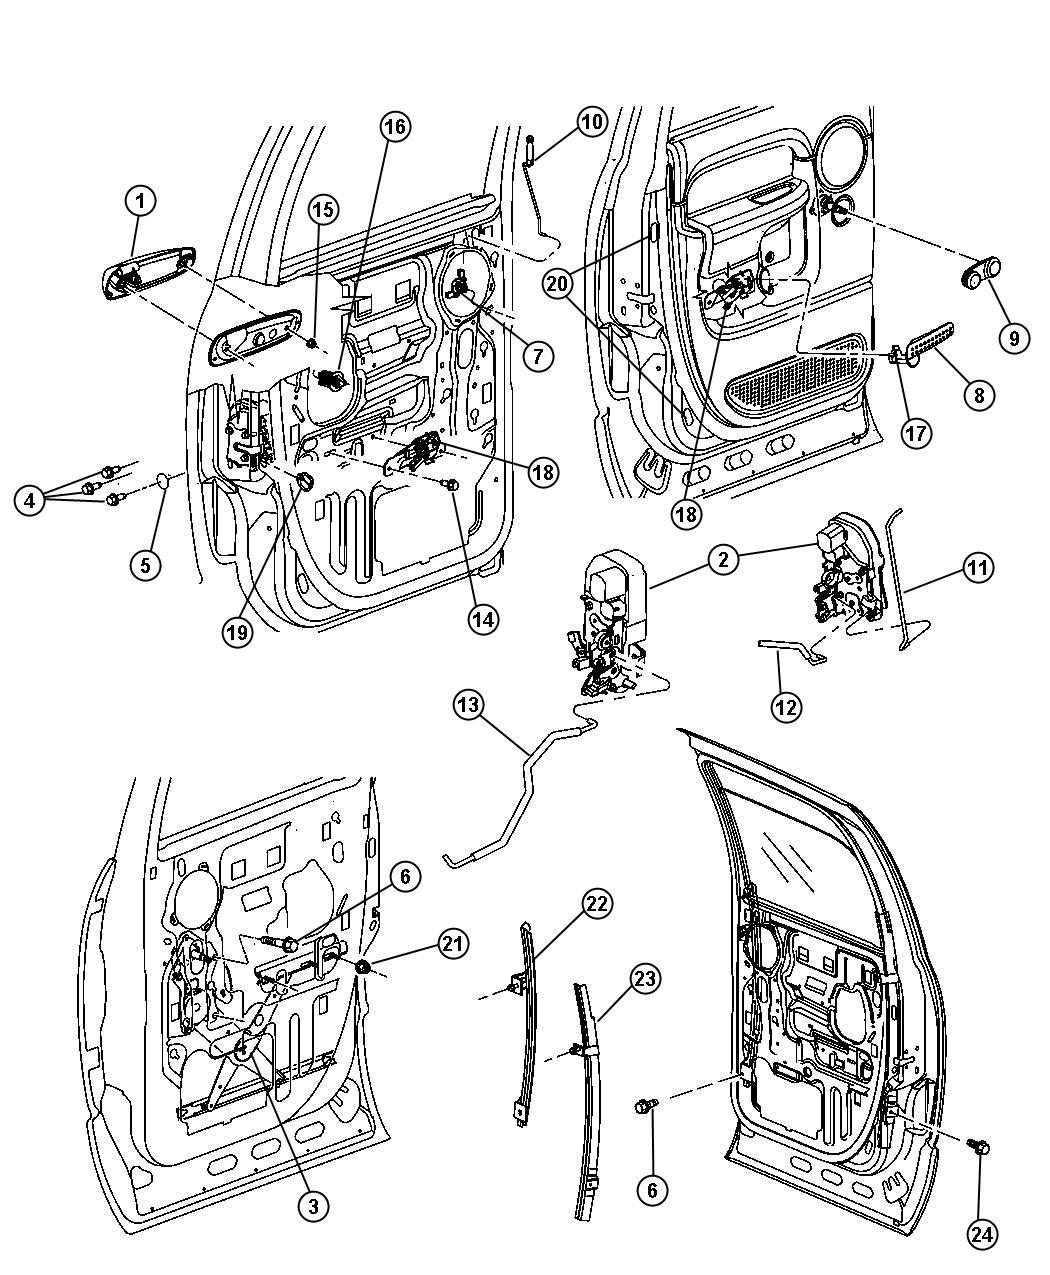 Dodge Ram 3500 Latch. Rear door. Locks, manual, power